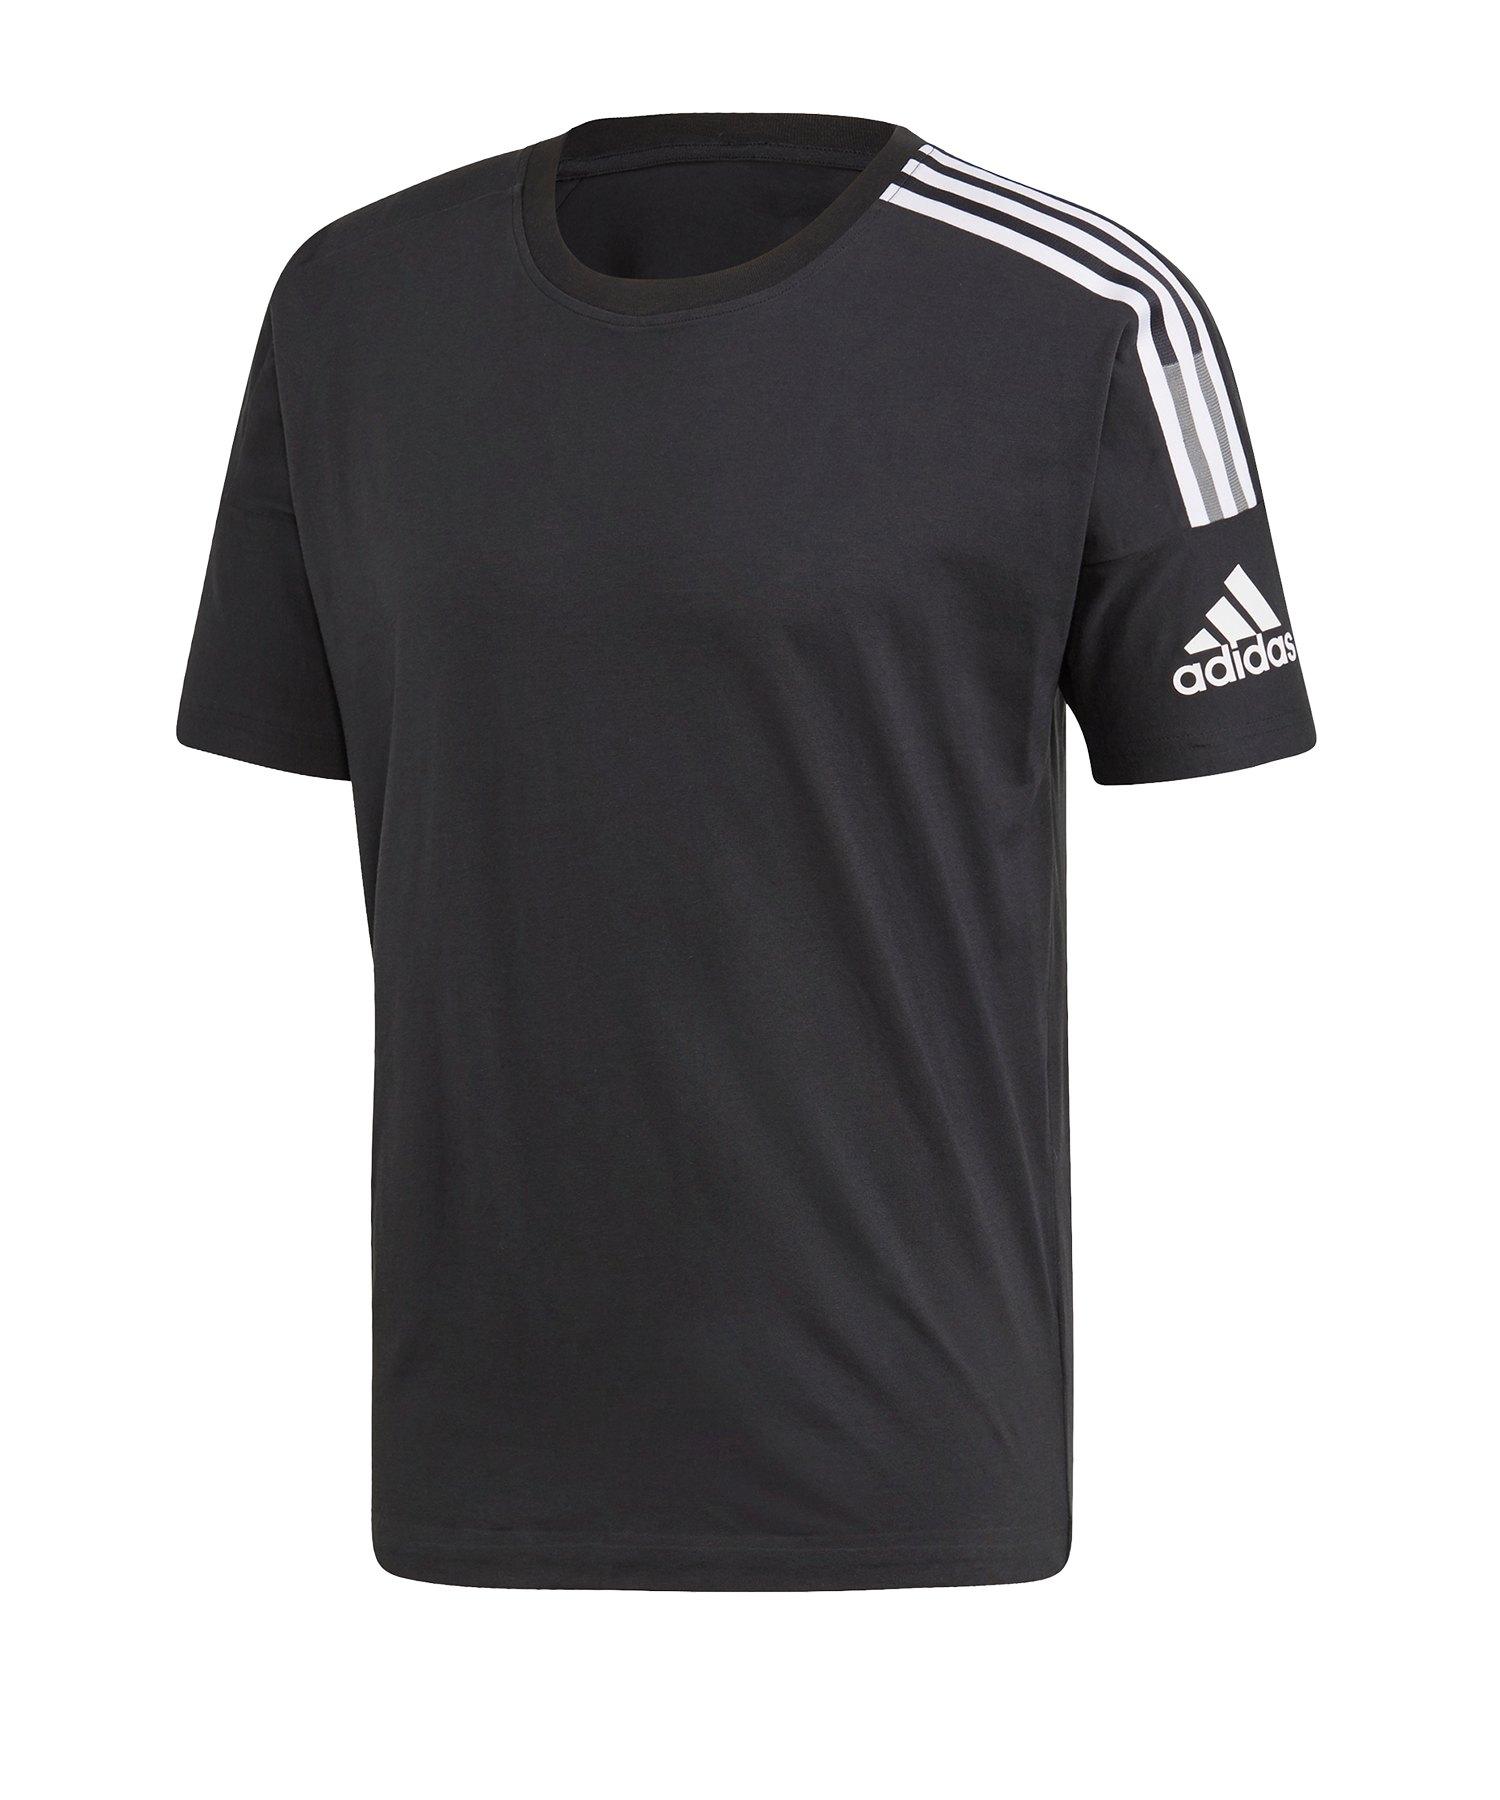 adidas Z.N.E. Tee T-Shirt Schwarz - schwarz